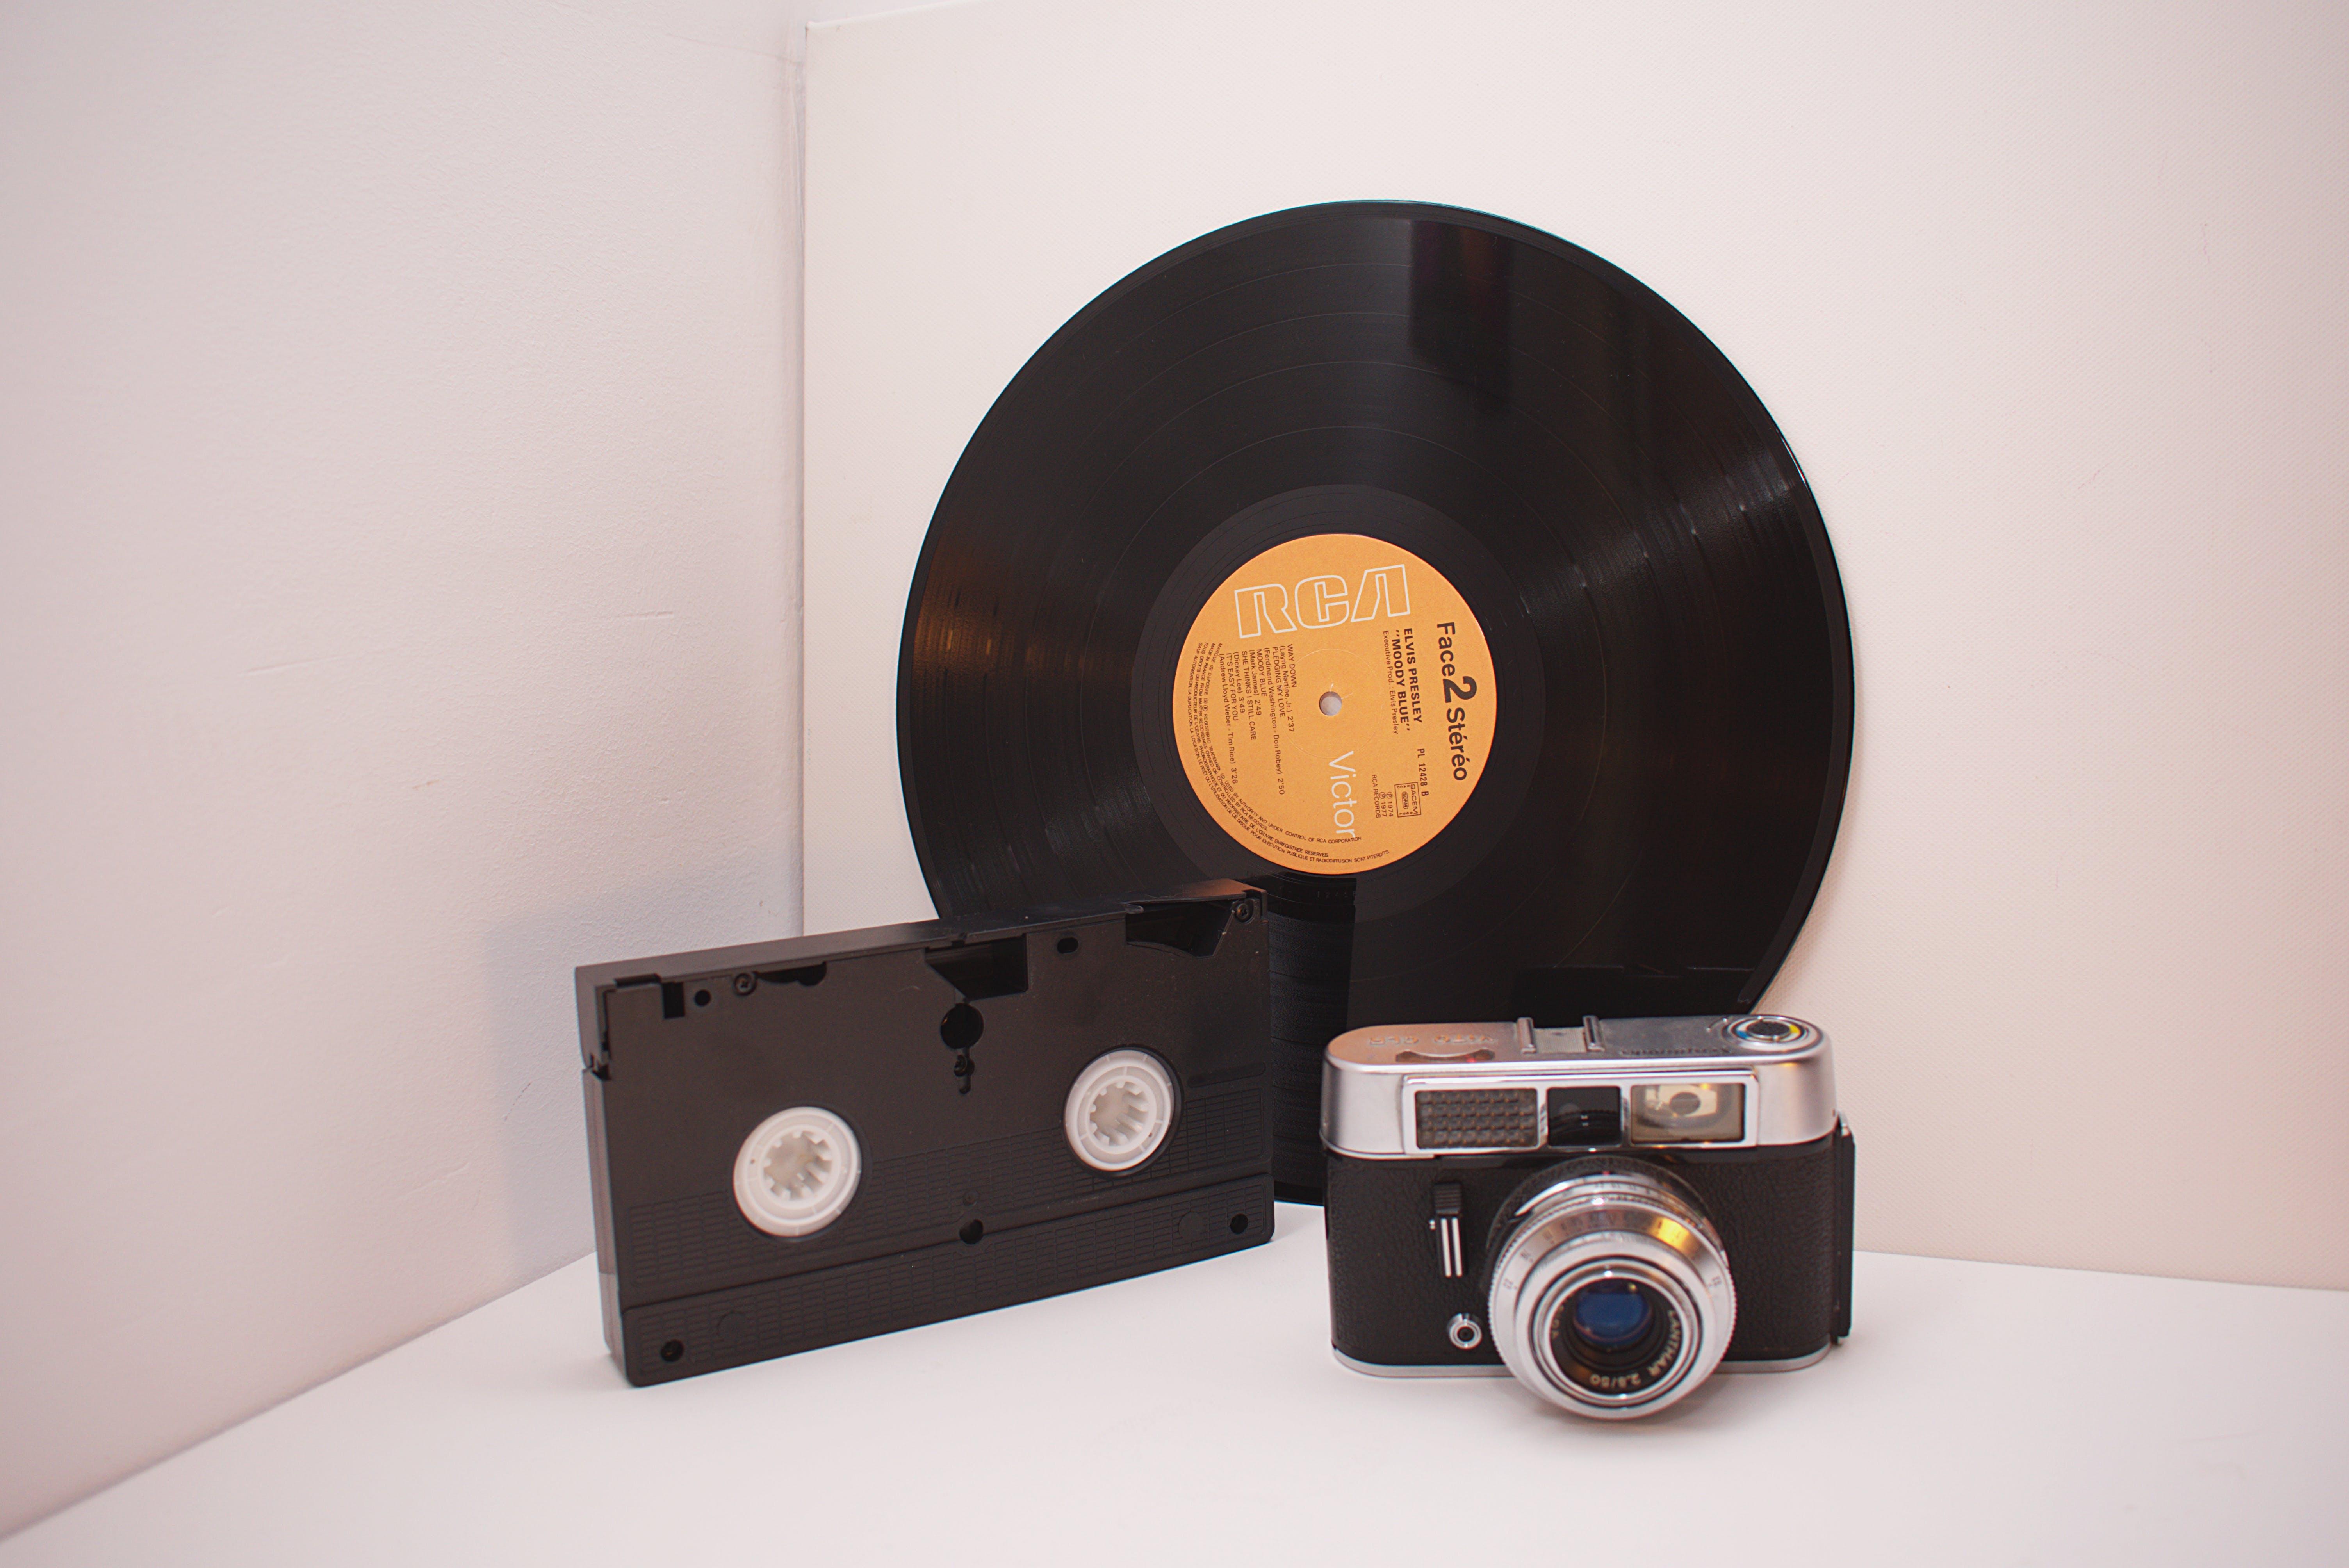 Black Vinyl Disc, Black Vhs Tape And Camera